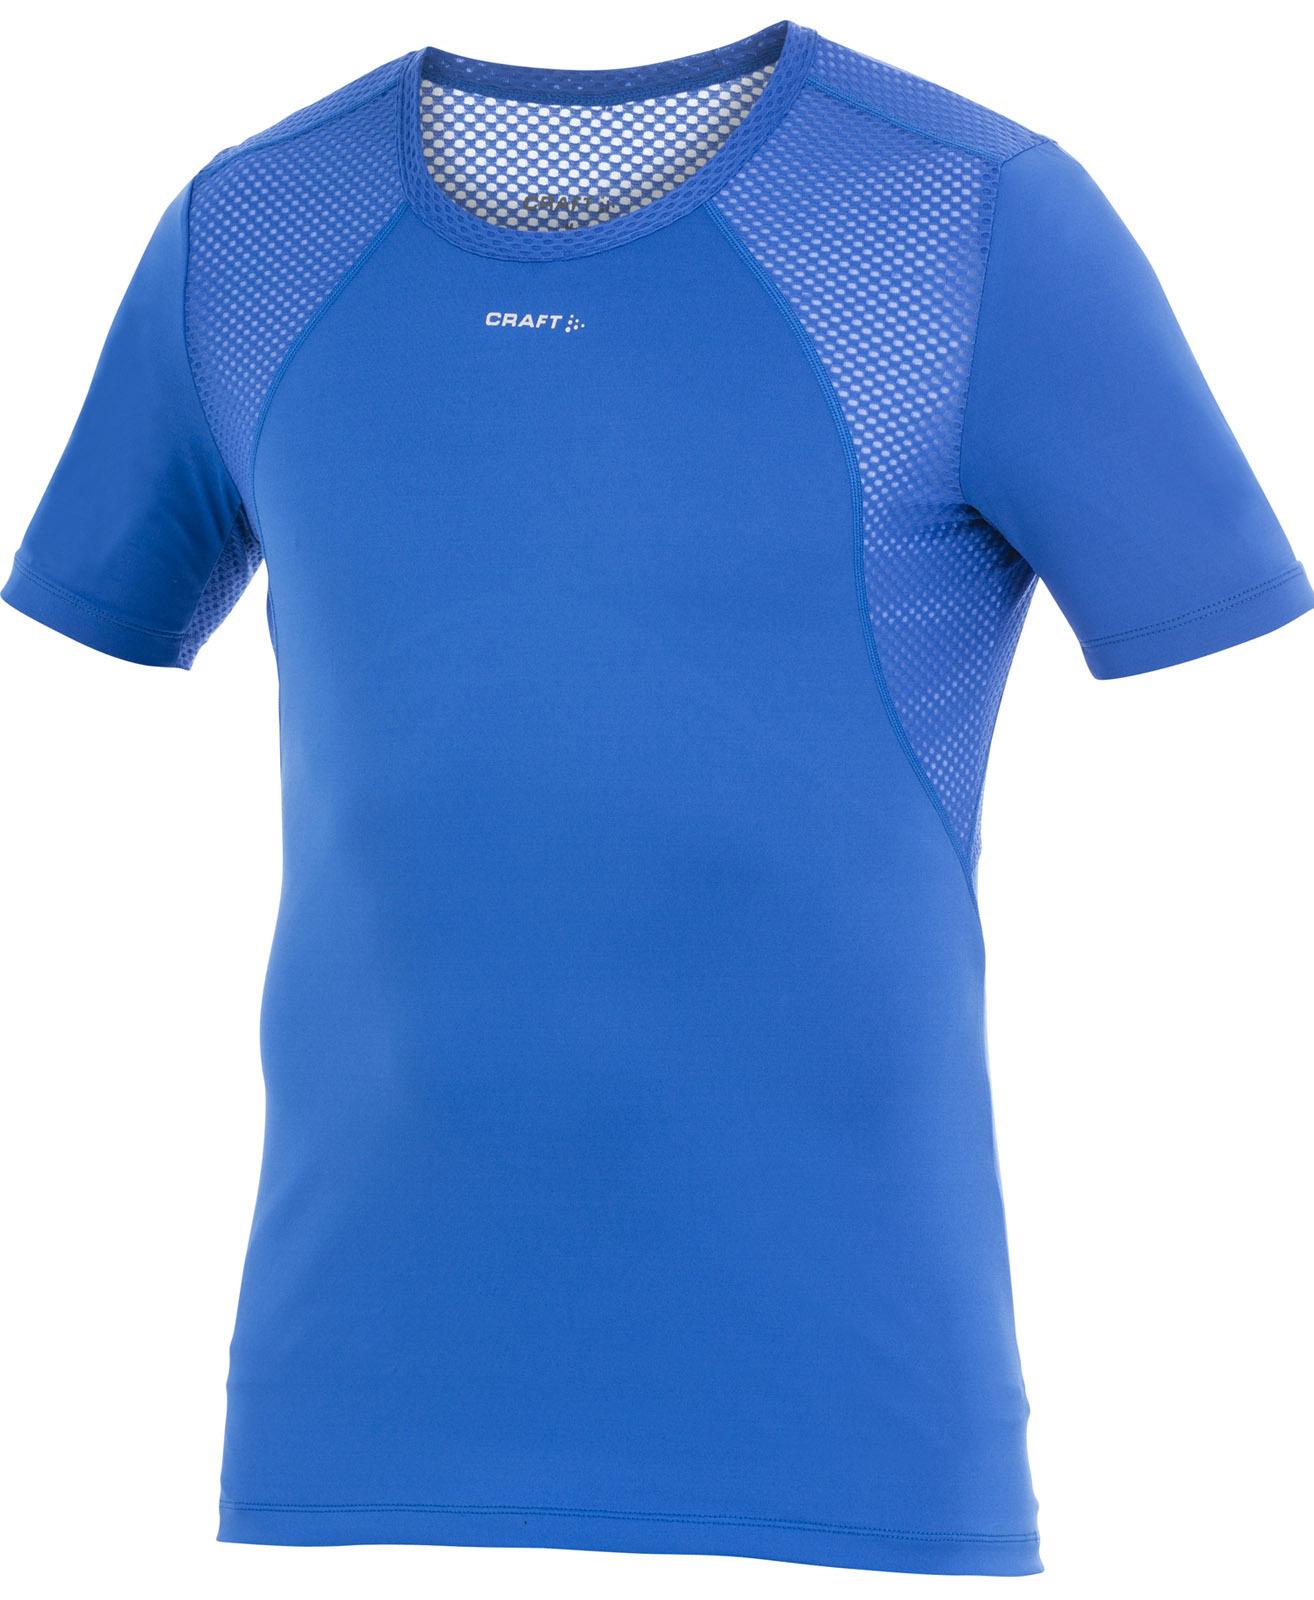 Футболка беговая мужская Craft Cool Concept blue